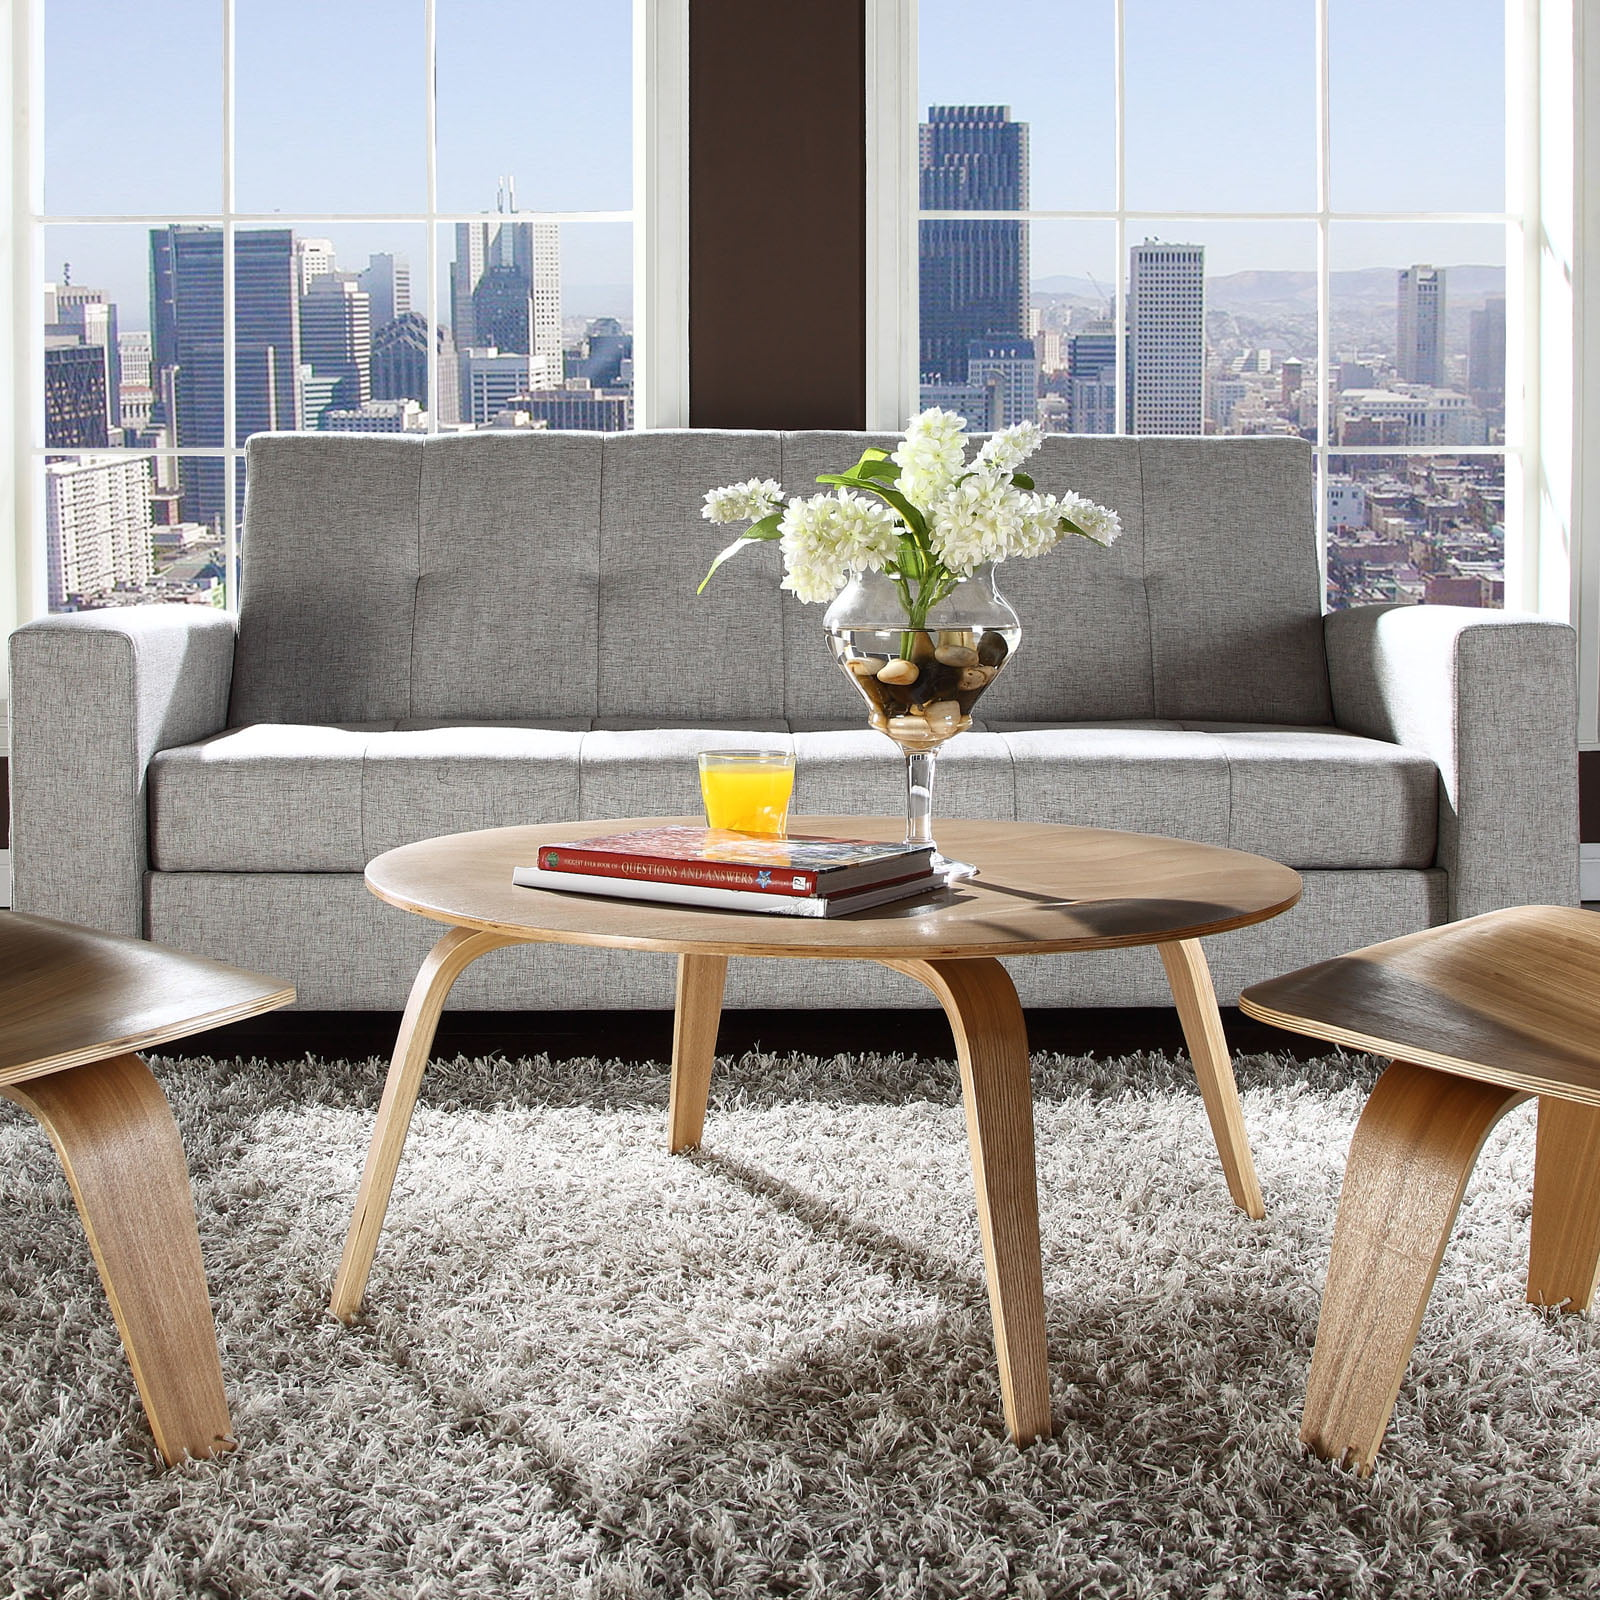 Eames Coffee Table Replica